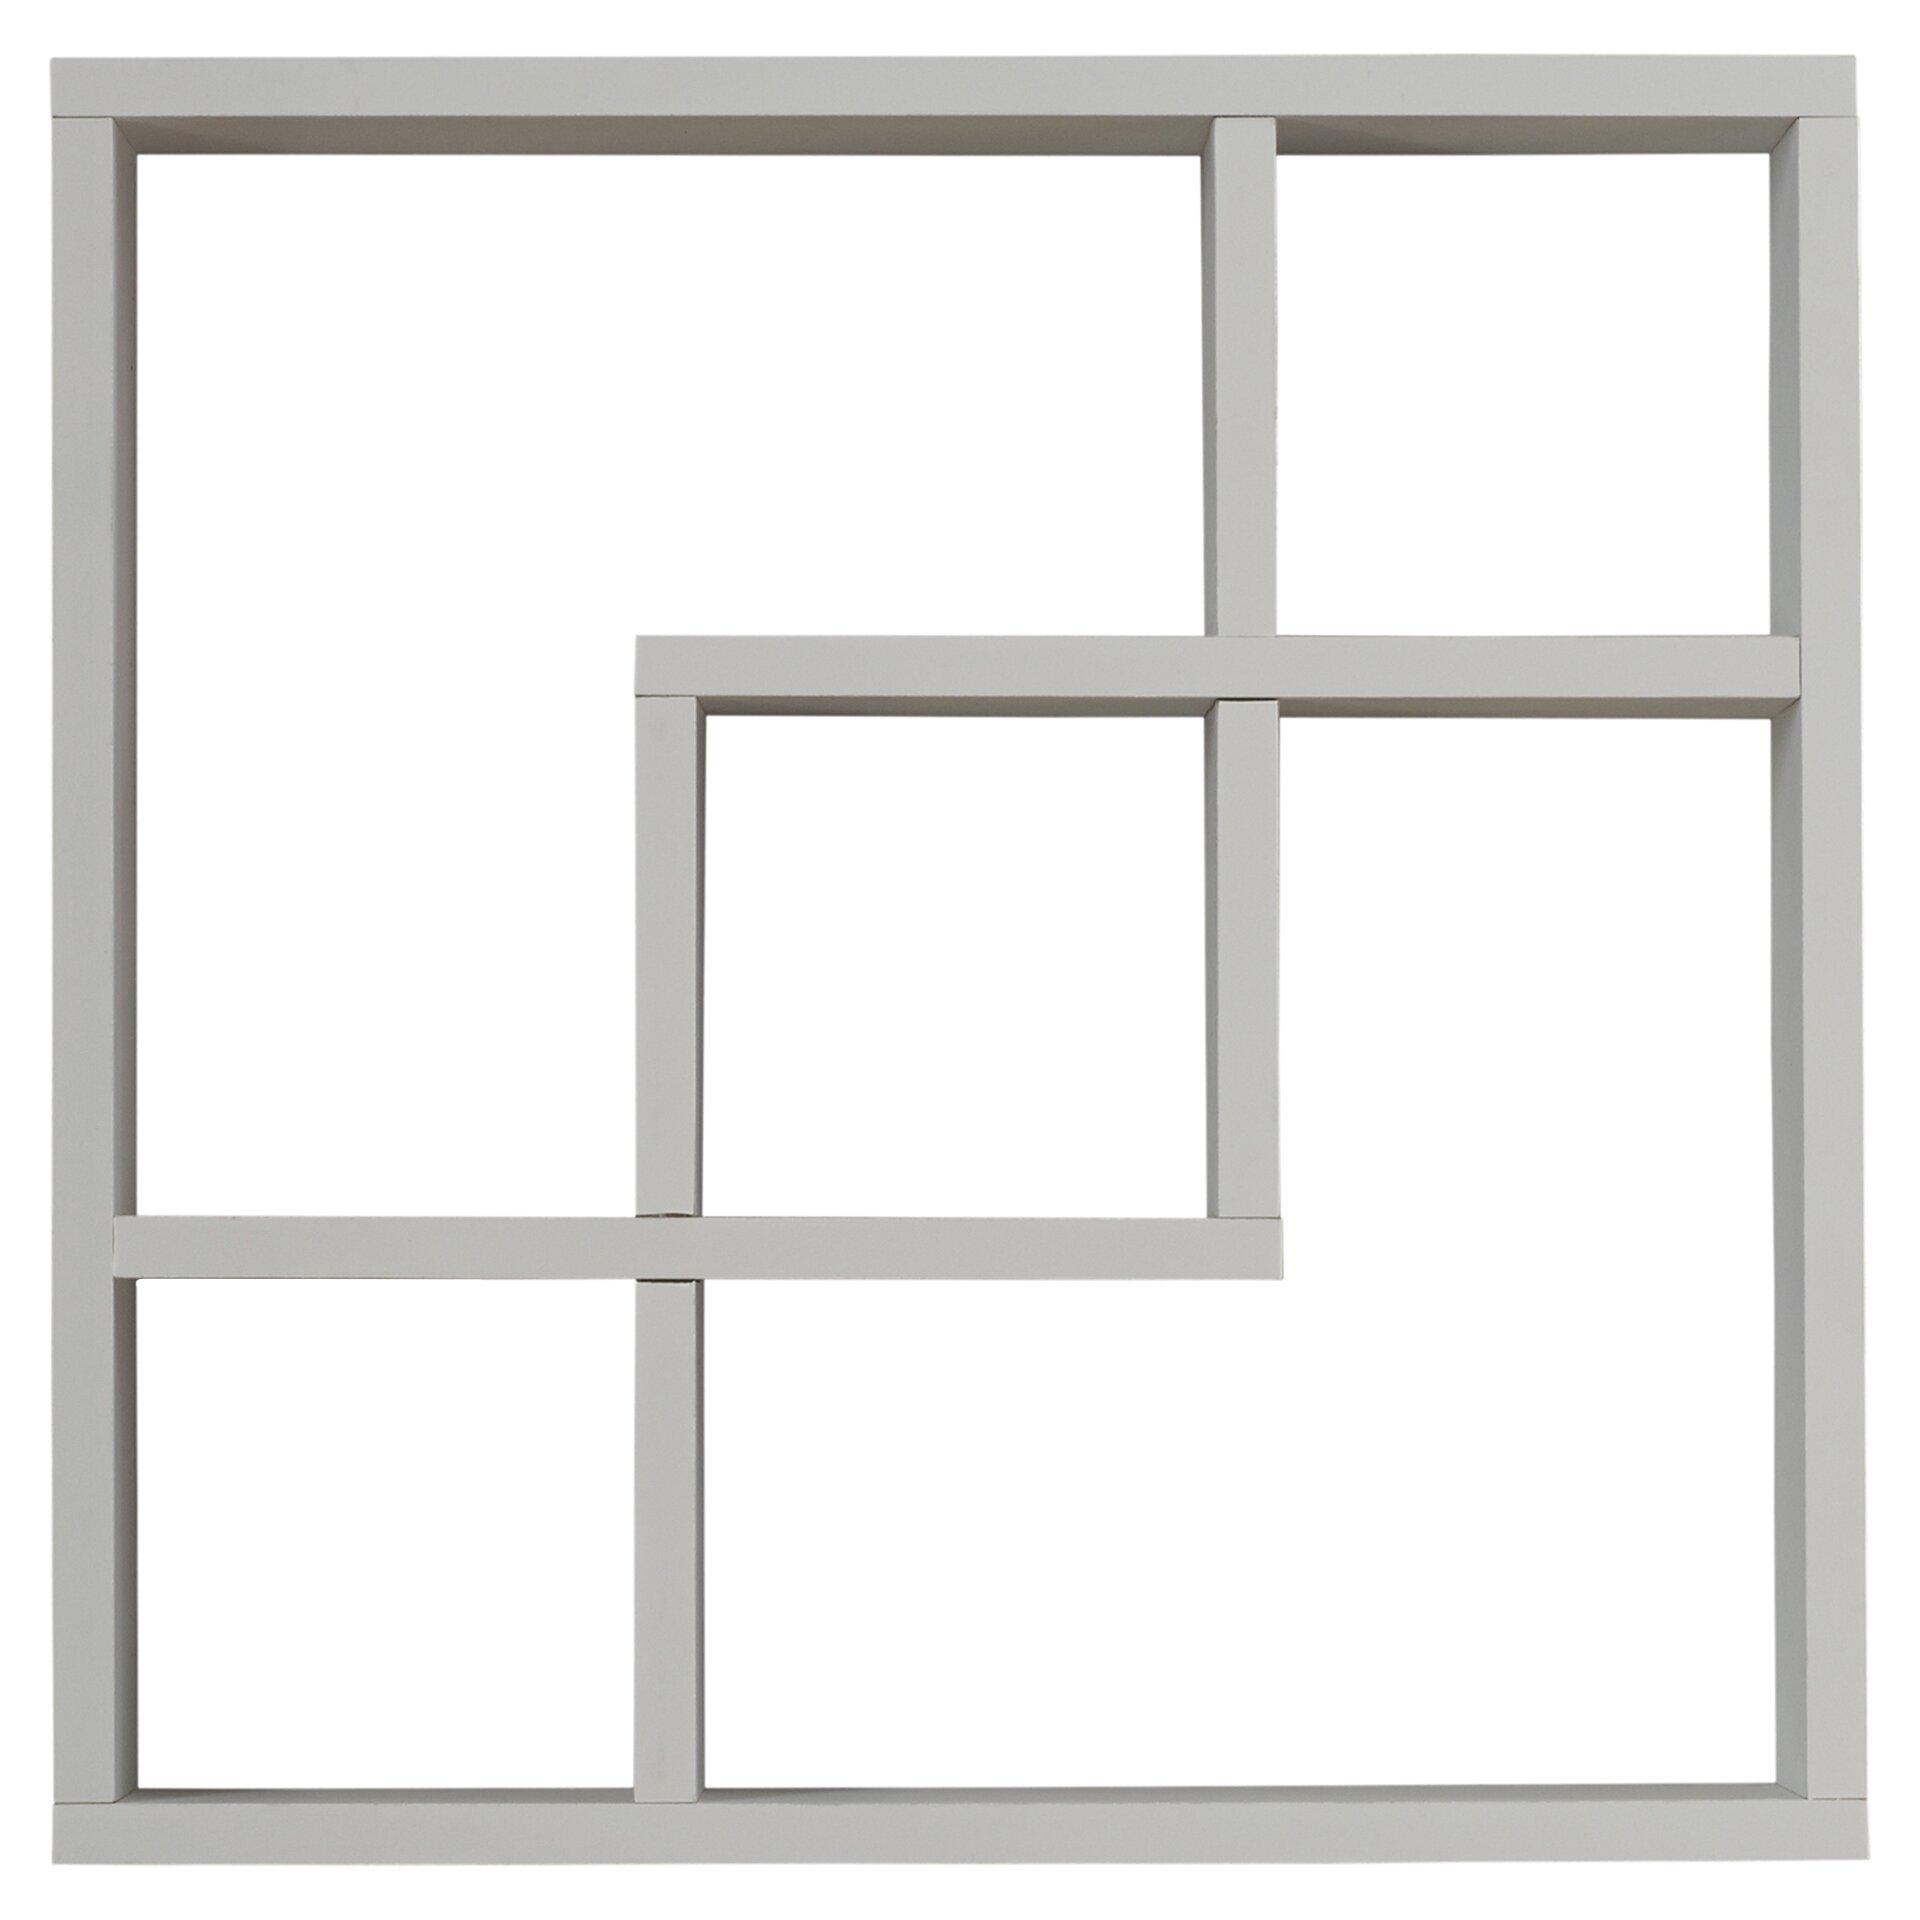 Mercer41 Freed Geometric Square Wall Shelf Reviews Wayfair